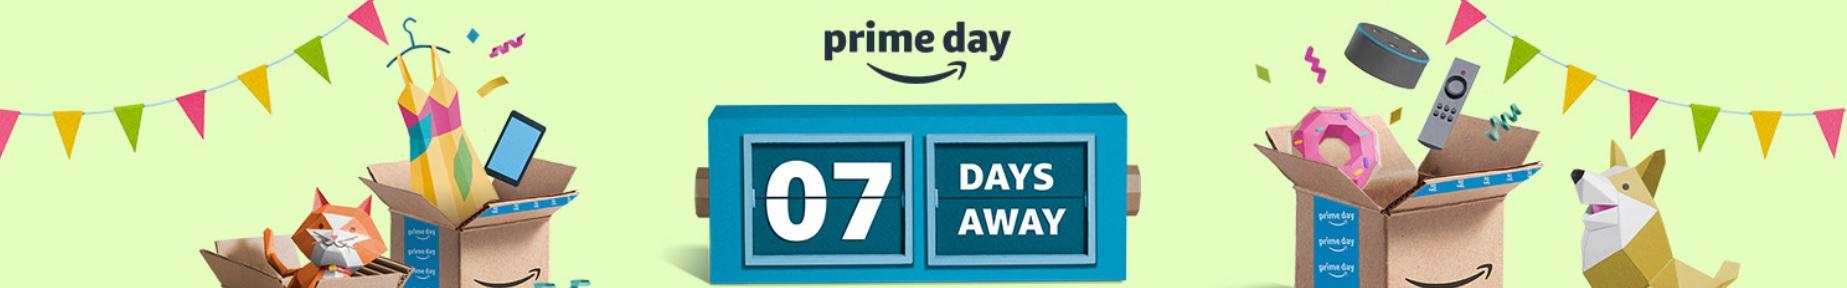 Amazon Prime Day title 2018